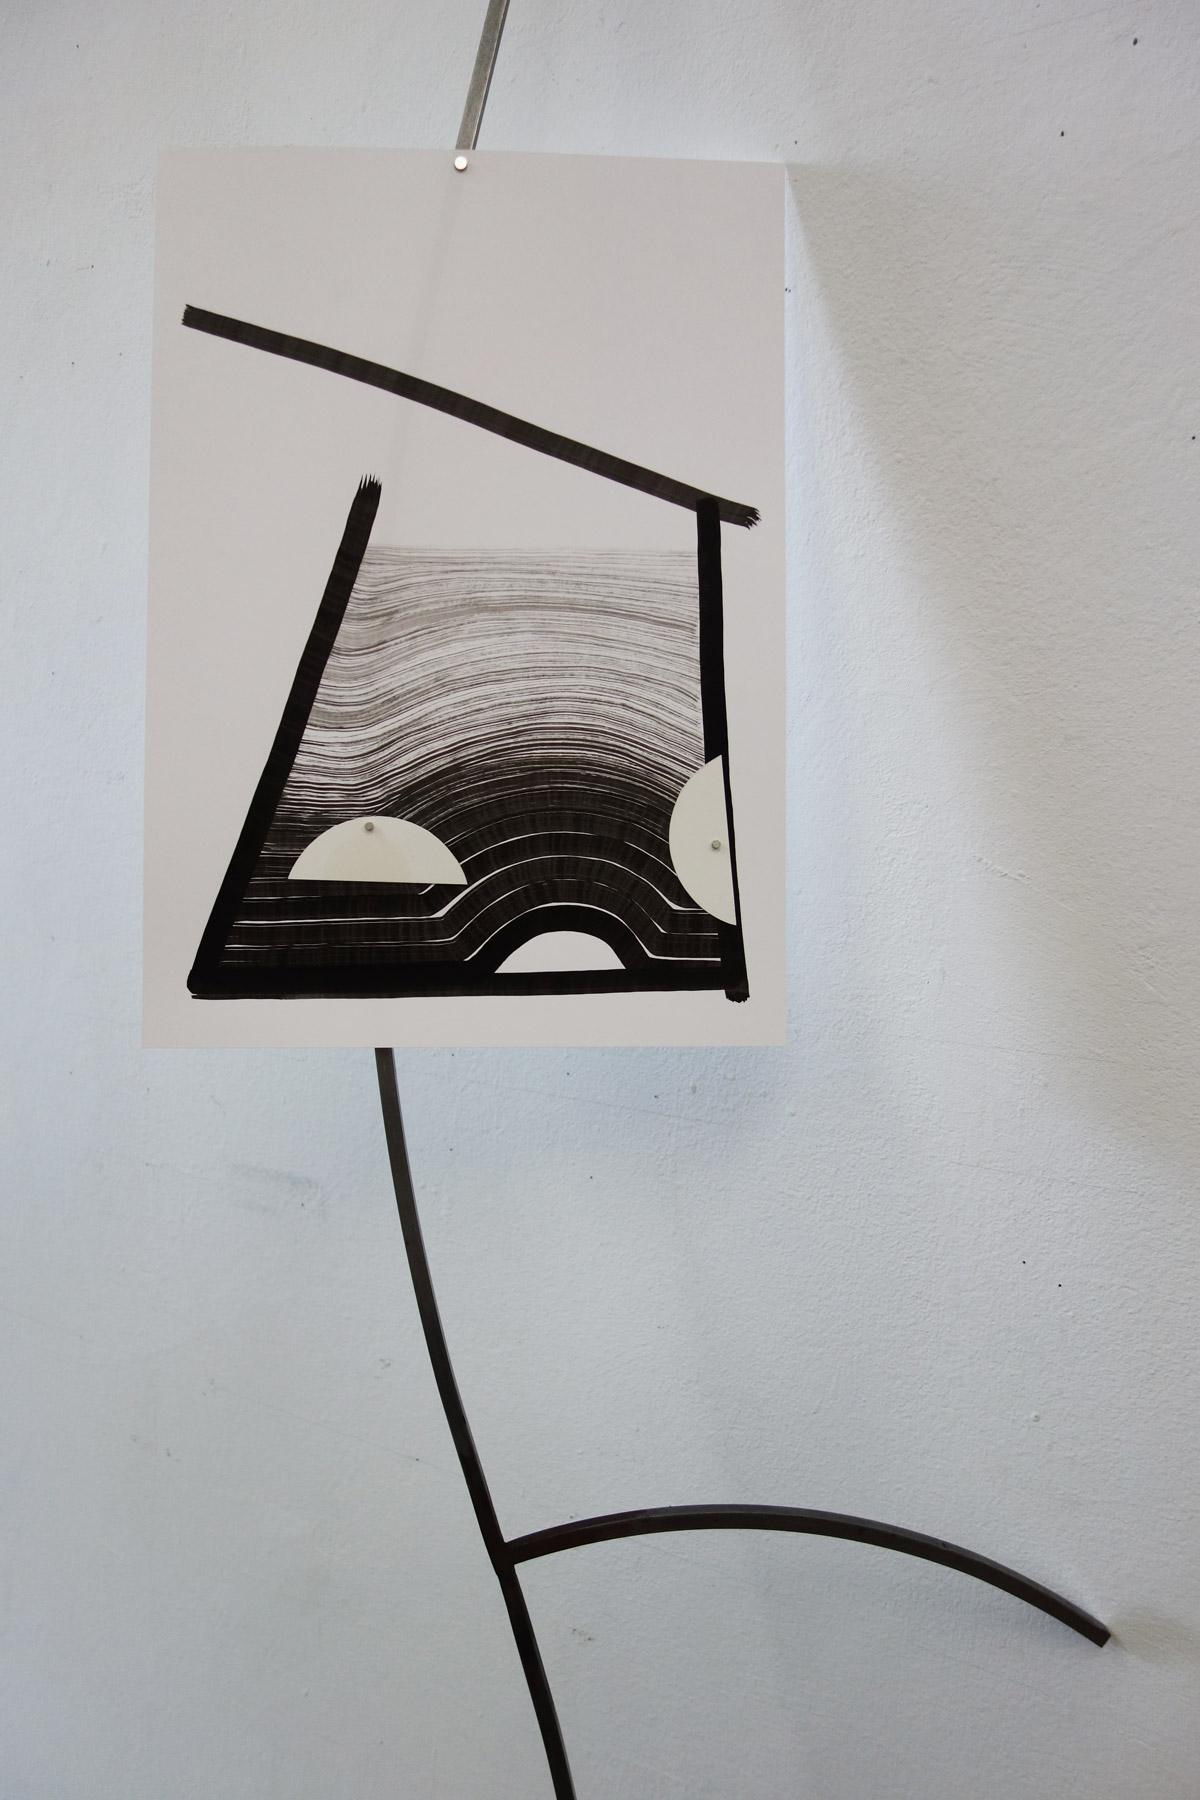 Nina Annabelle Märkl | Flower 1 | Ink and steel, magnet | 170 x 50 x 20 cm |2018